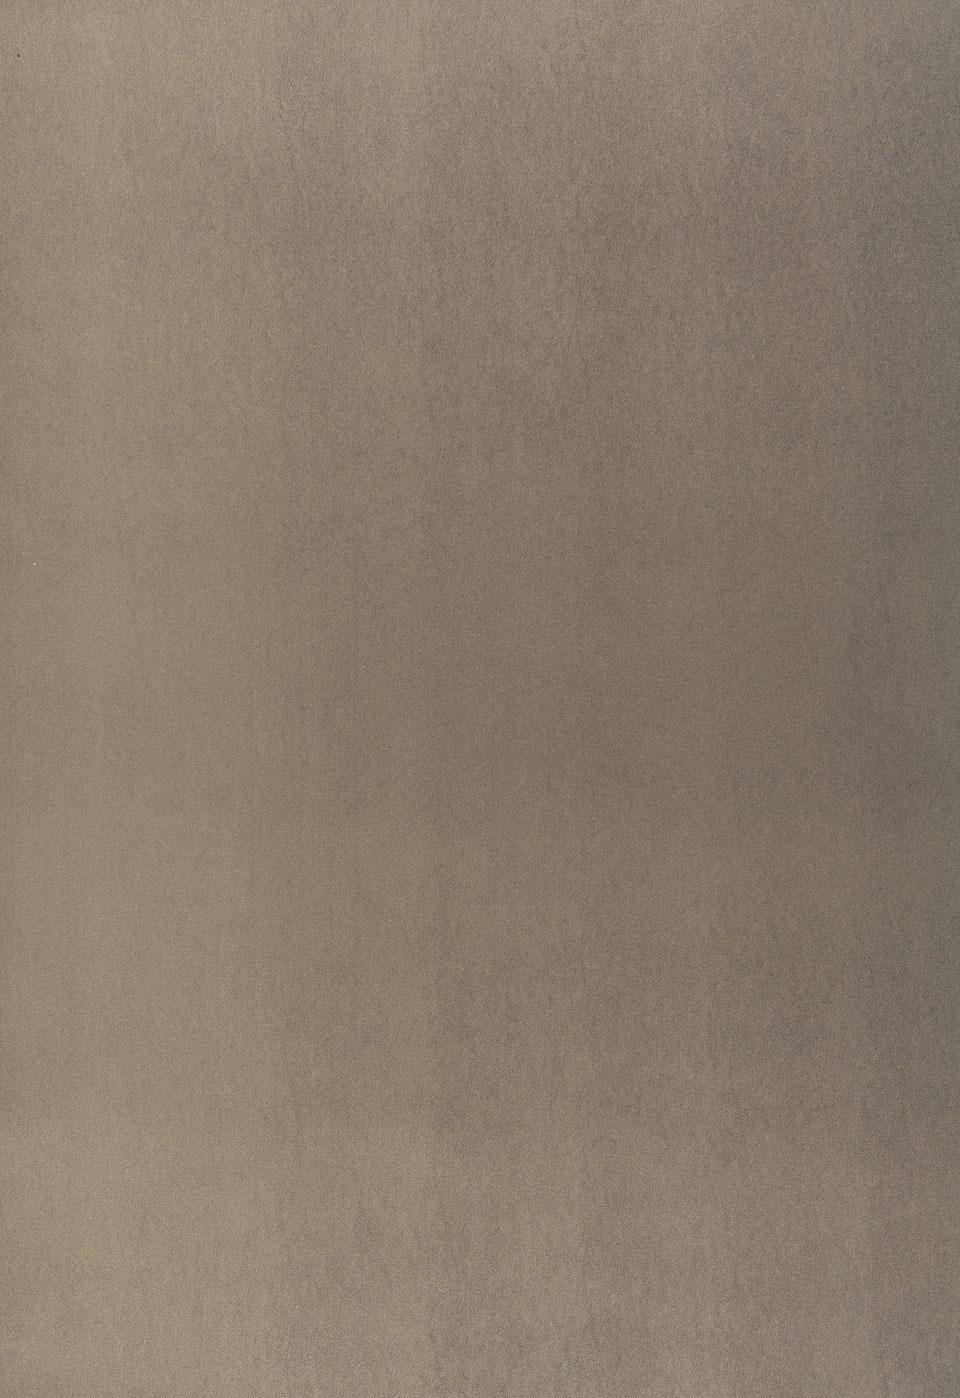 Американские обои Schumacher,  коллекция Luxe Lodge, артикул5006311